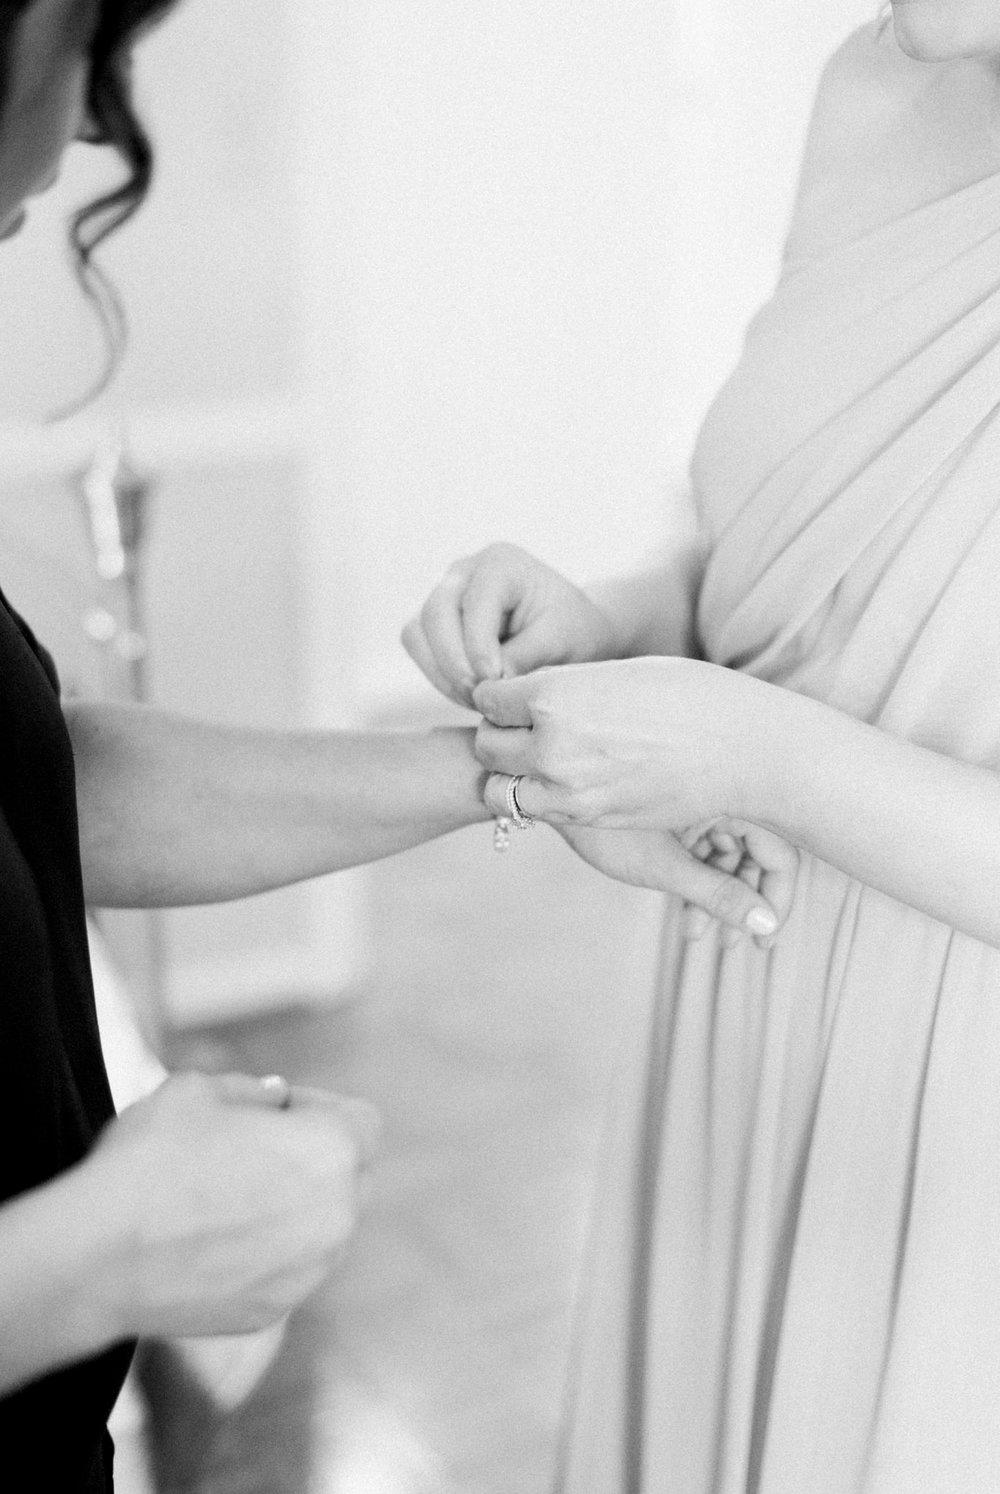 TheVirginianHotel_LynchburgVA_TheVirginianHotelWedding_Virginiaweddingphotographer_Lynchburgvawedding 6.jpg